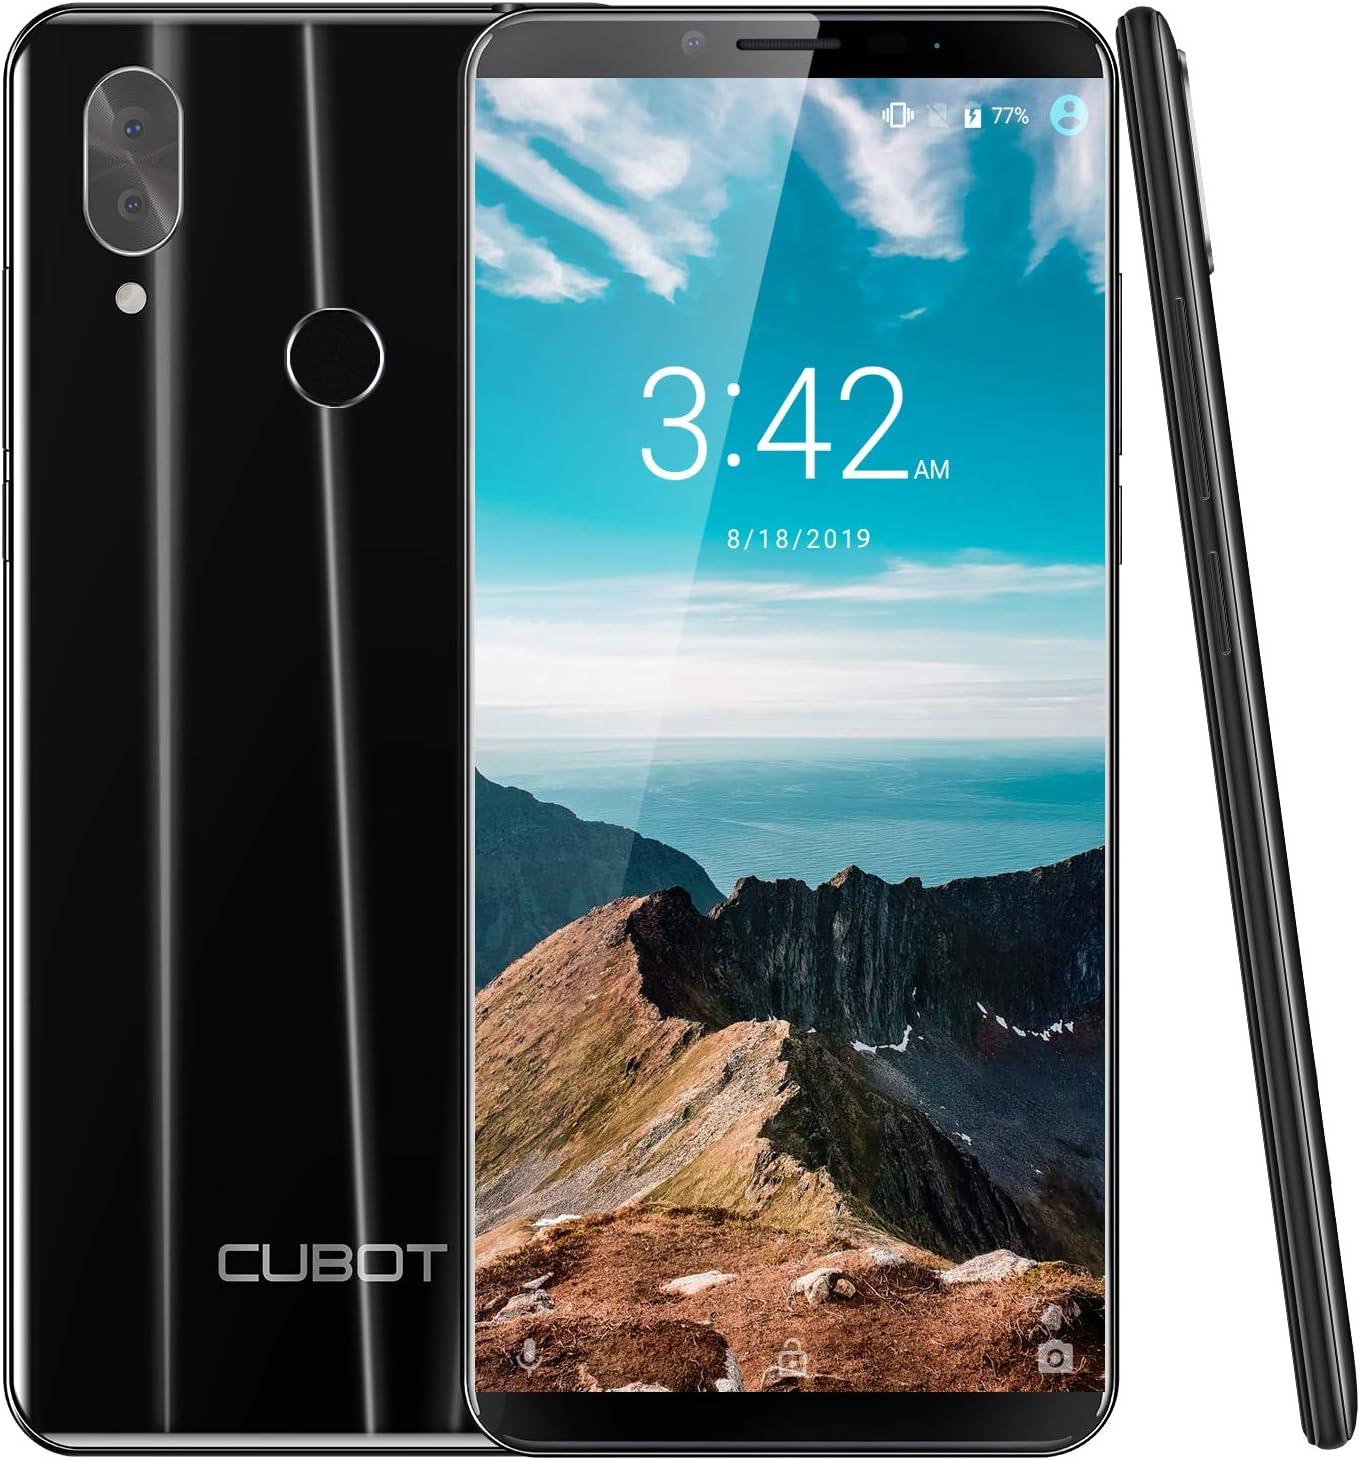 CUBOT X19 2019 Octa-Core Smartphone Libre 4G Android 9.0 4GB RAM+ 64GB ROM 18:9 5.93